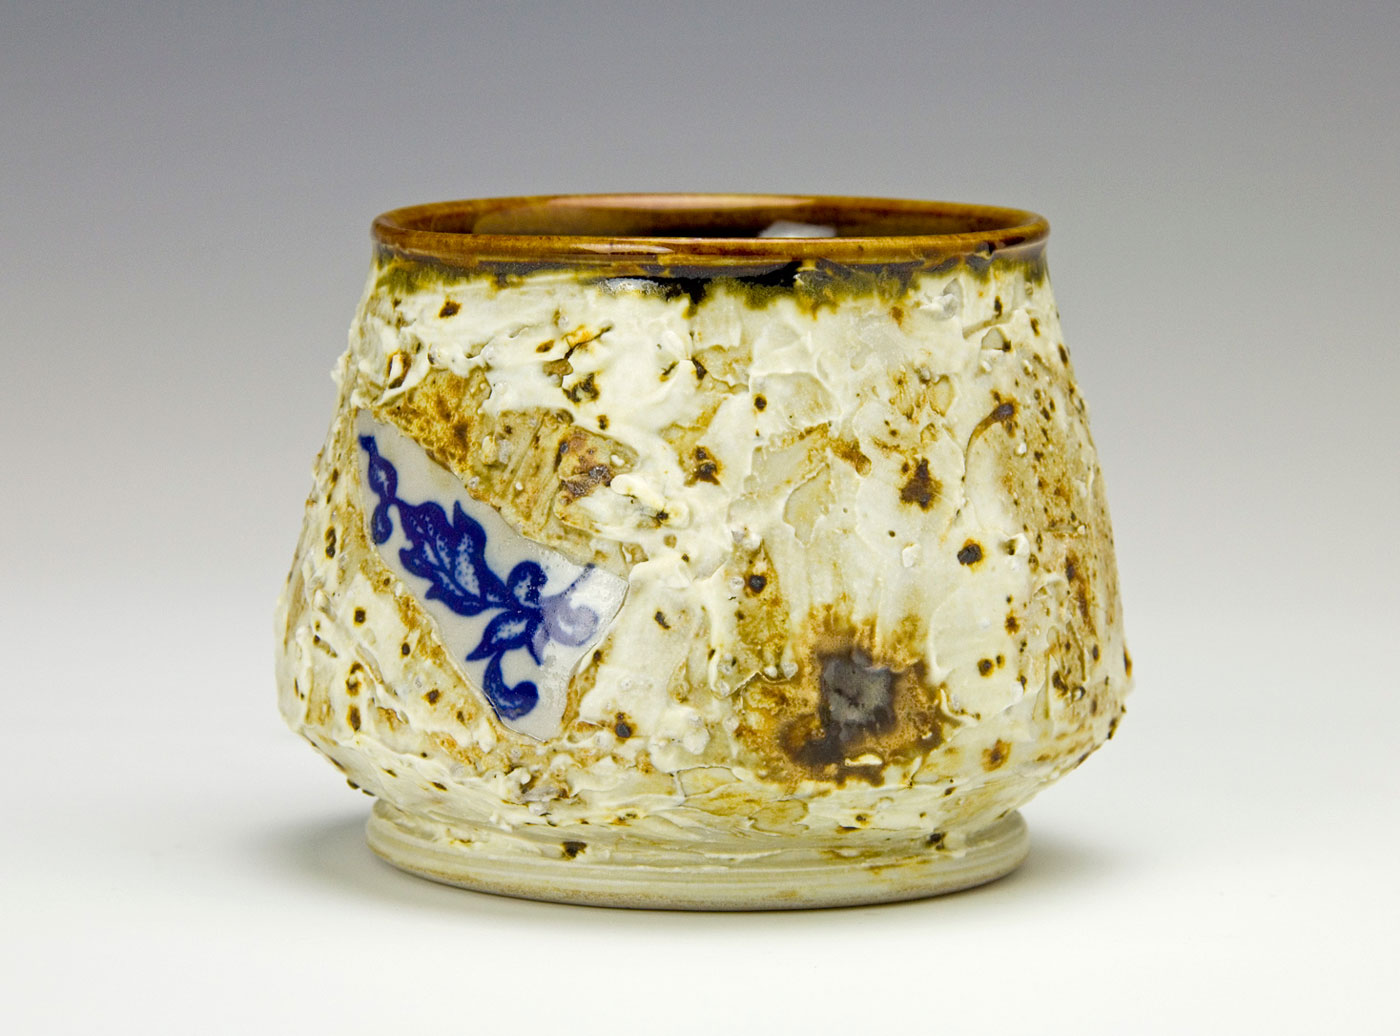 Yunomi-Wild-Clay-Art-Cup-Bruce-Gholson.jpg